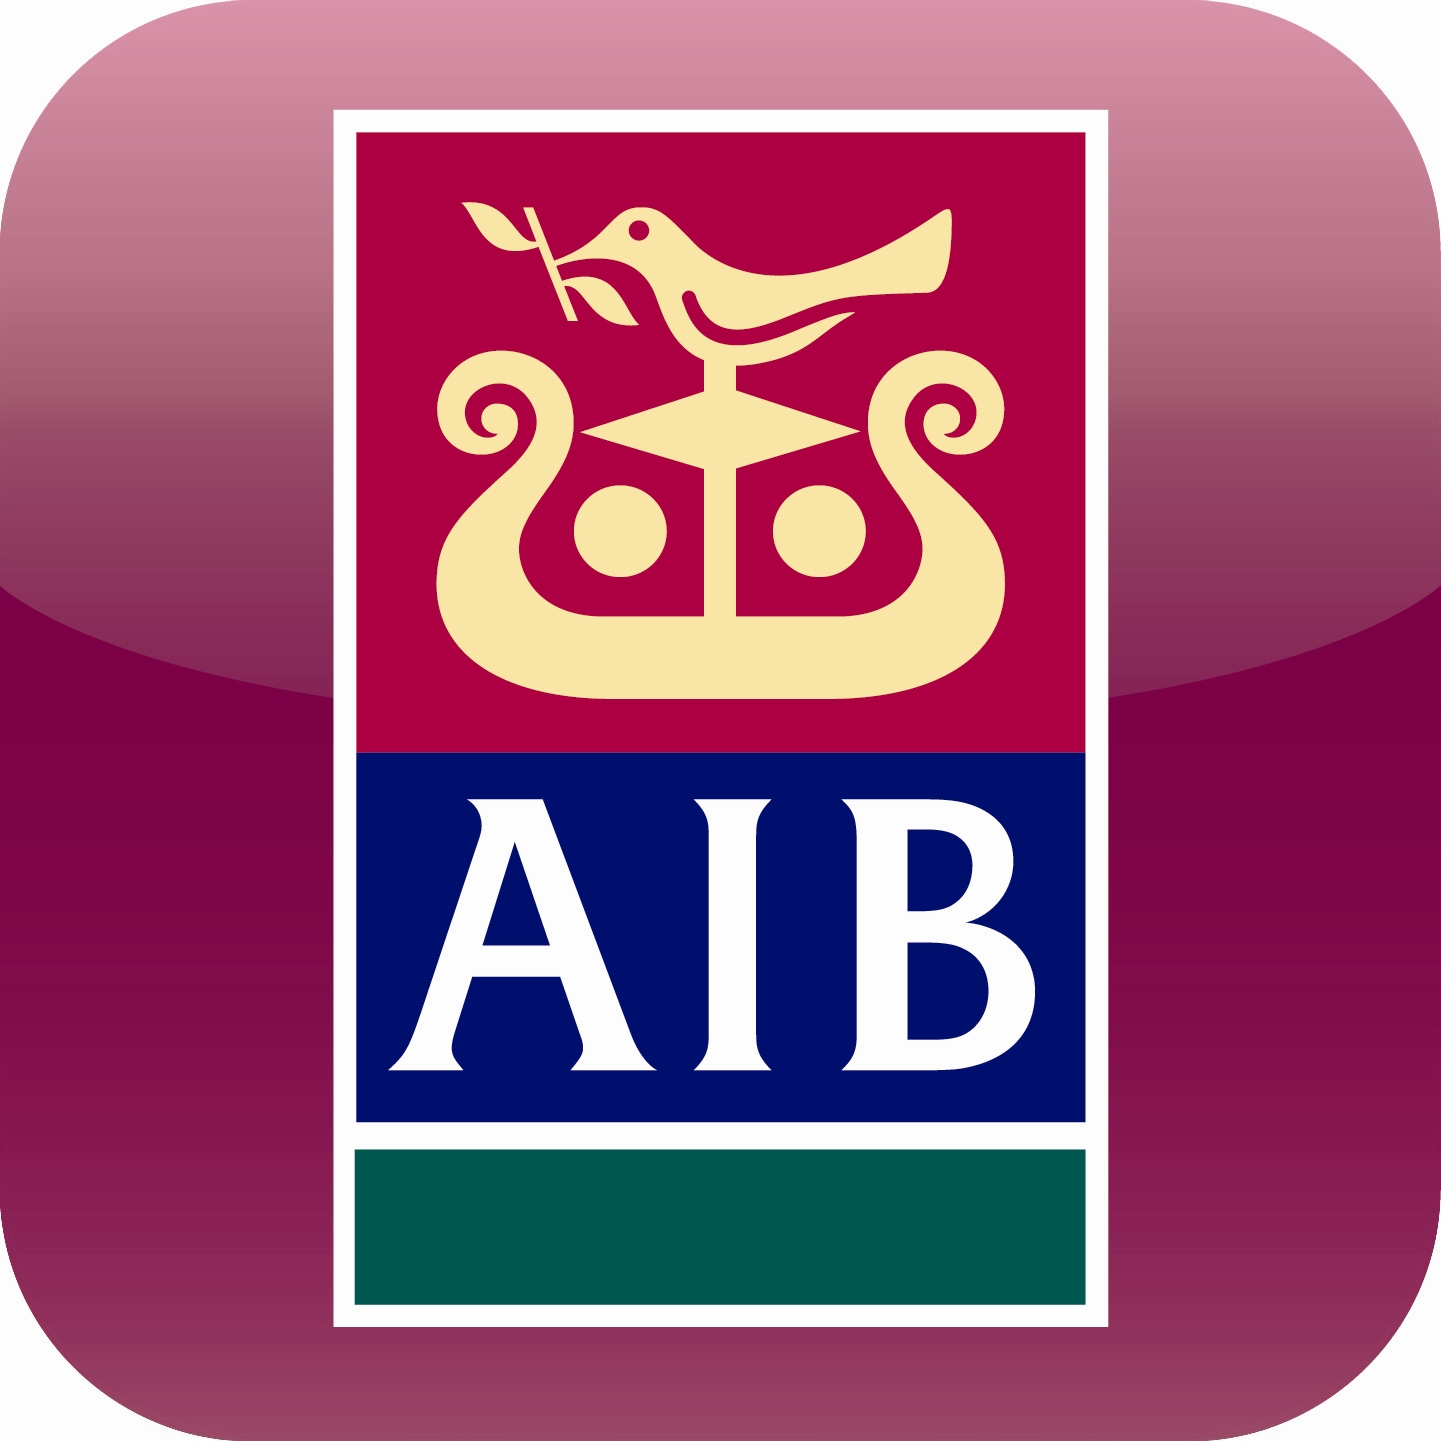 http://3xedigital.com/wp-content/uploads/2016/03/AIB_logo.jpg